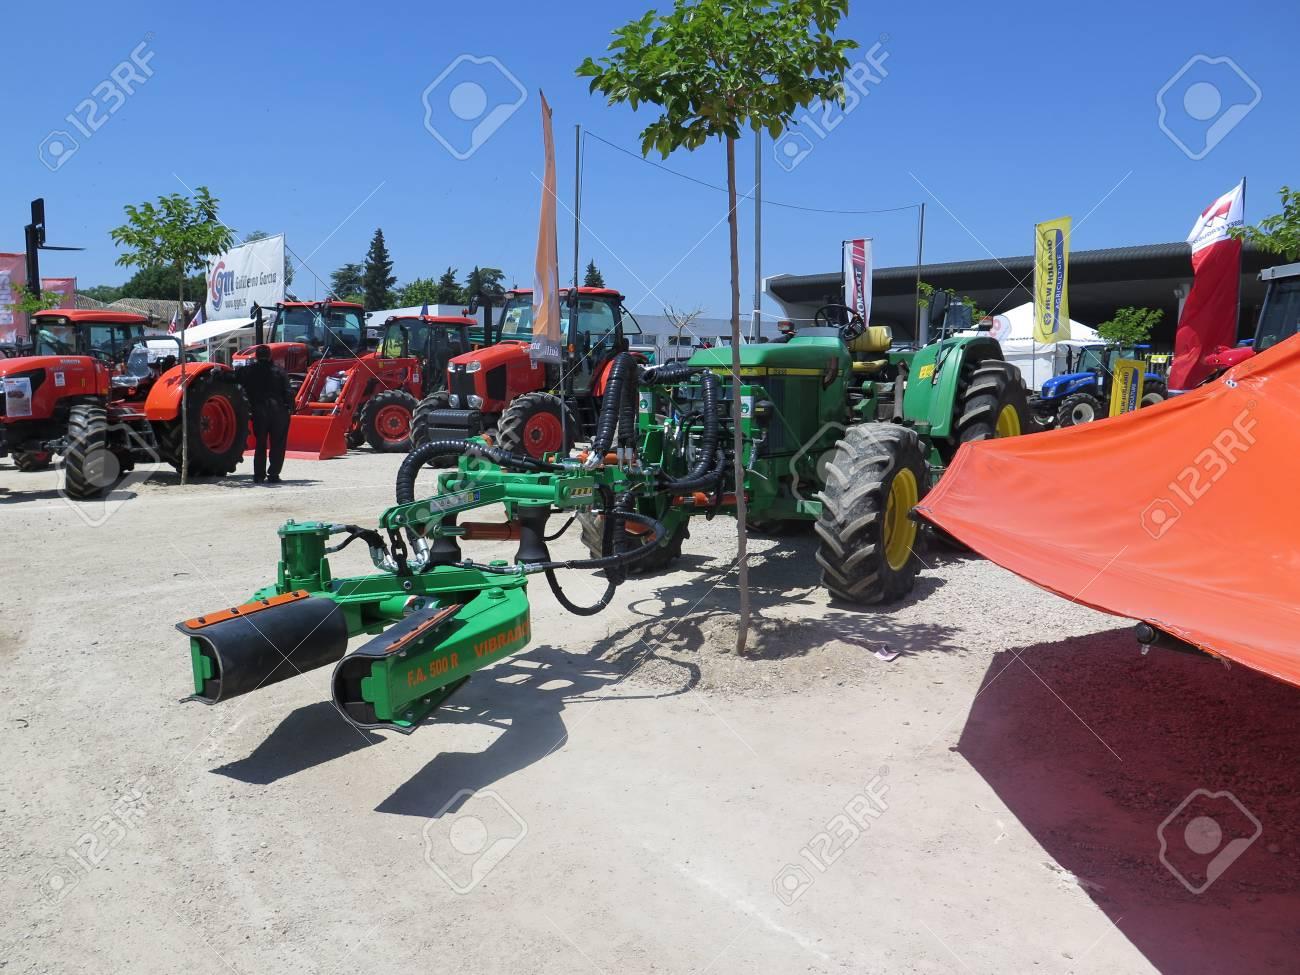 Ubeda, Spain 4 June 2016: A trunk shaker olive harvesting machine